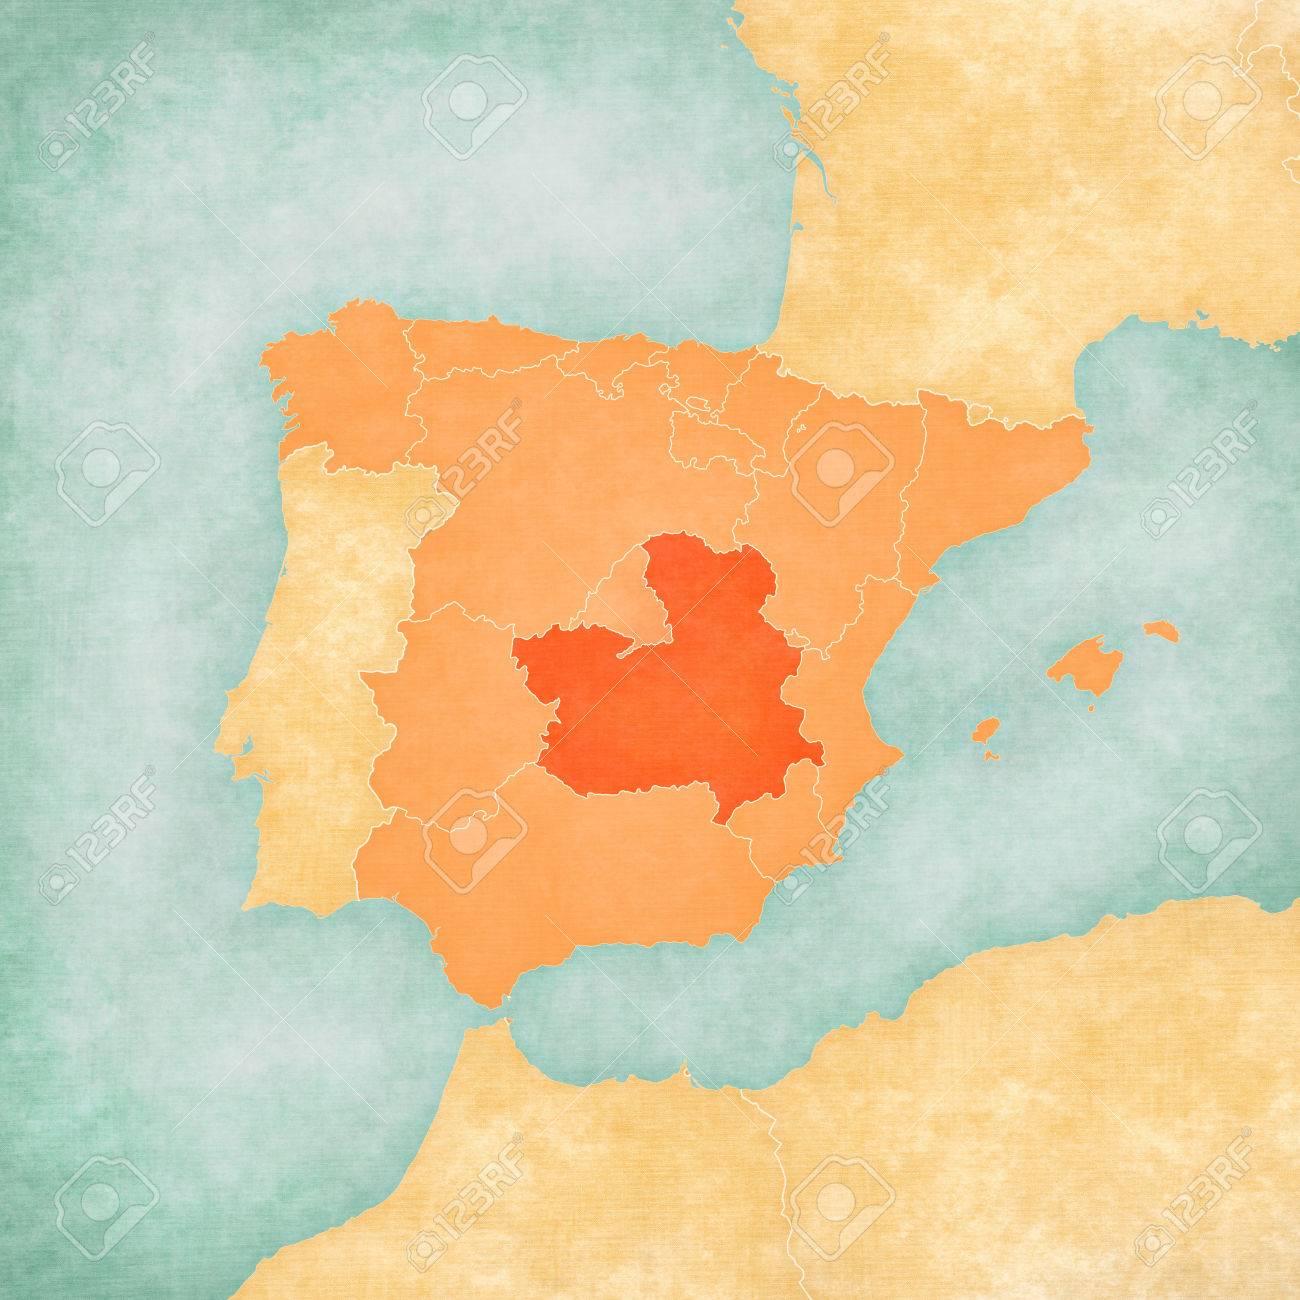 Map Of Spain La Mancha.Castilla La Mancha Spain On The Map Of Iberian Peninsula In